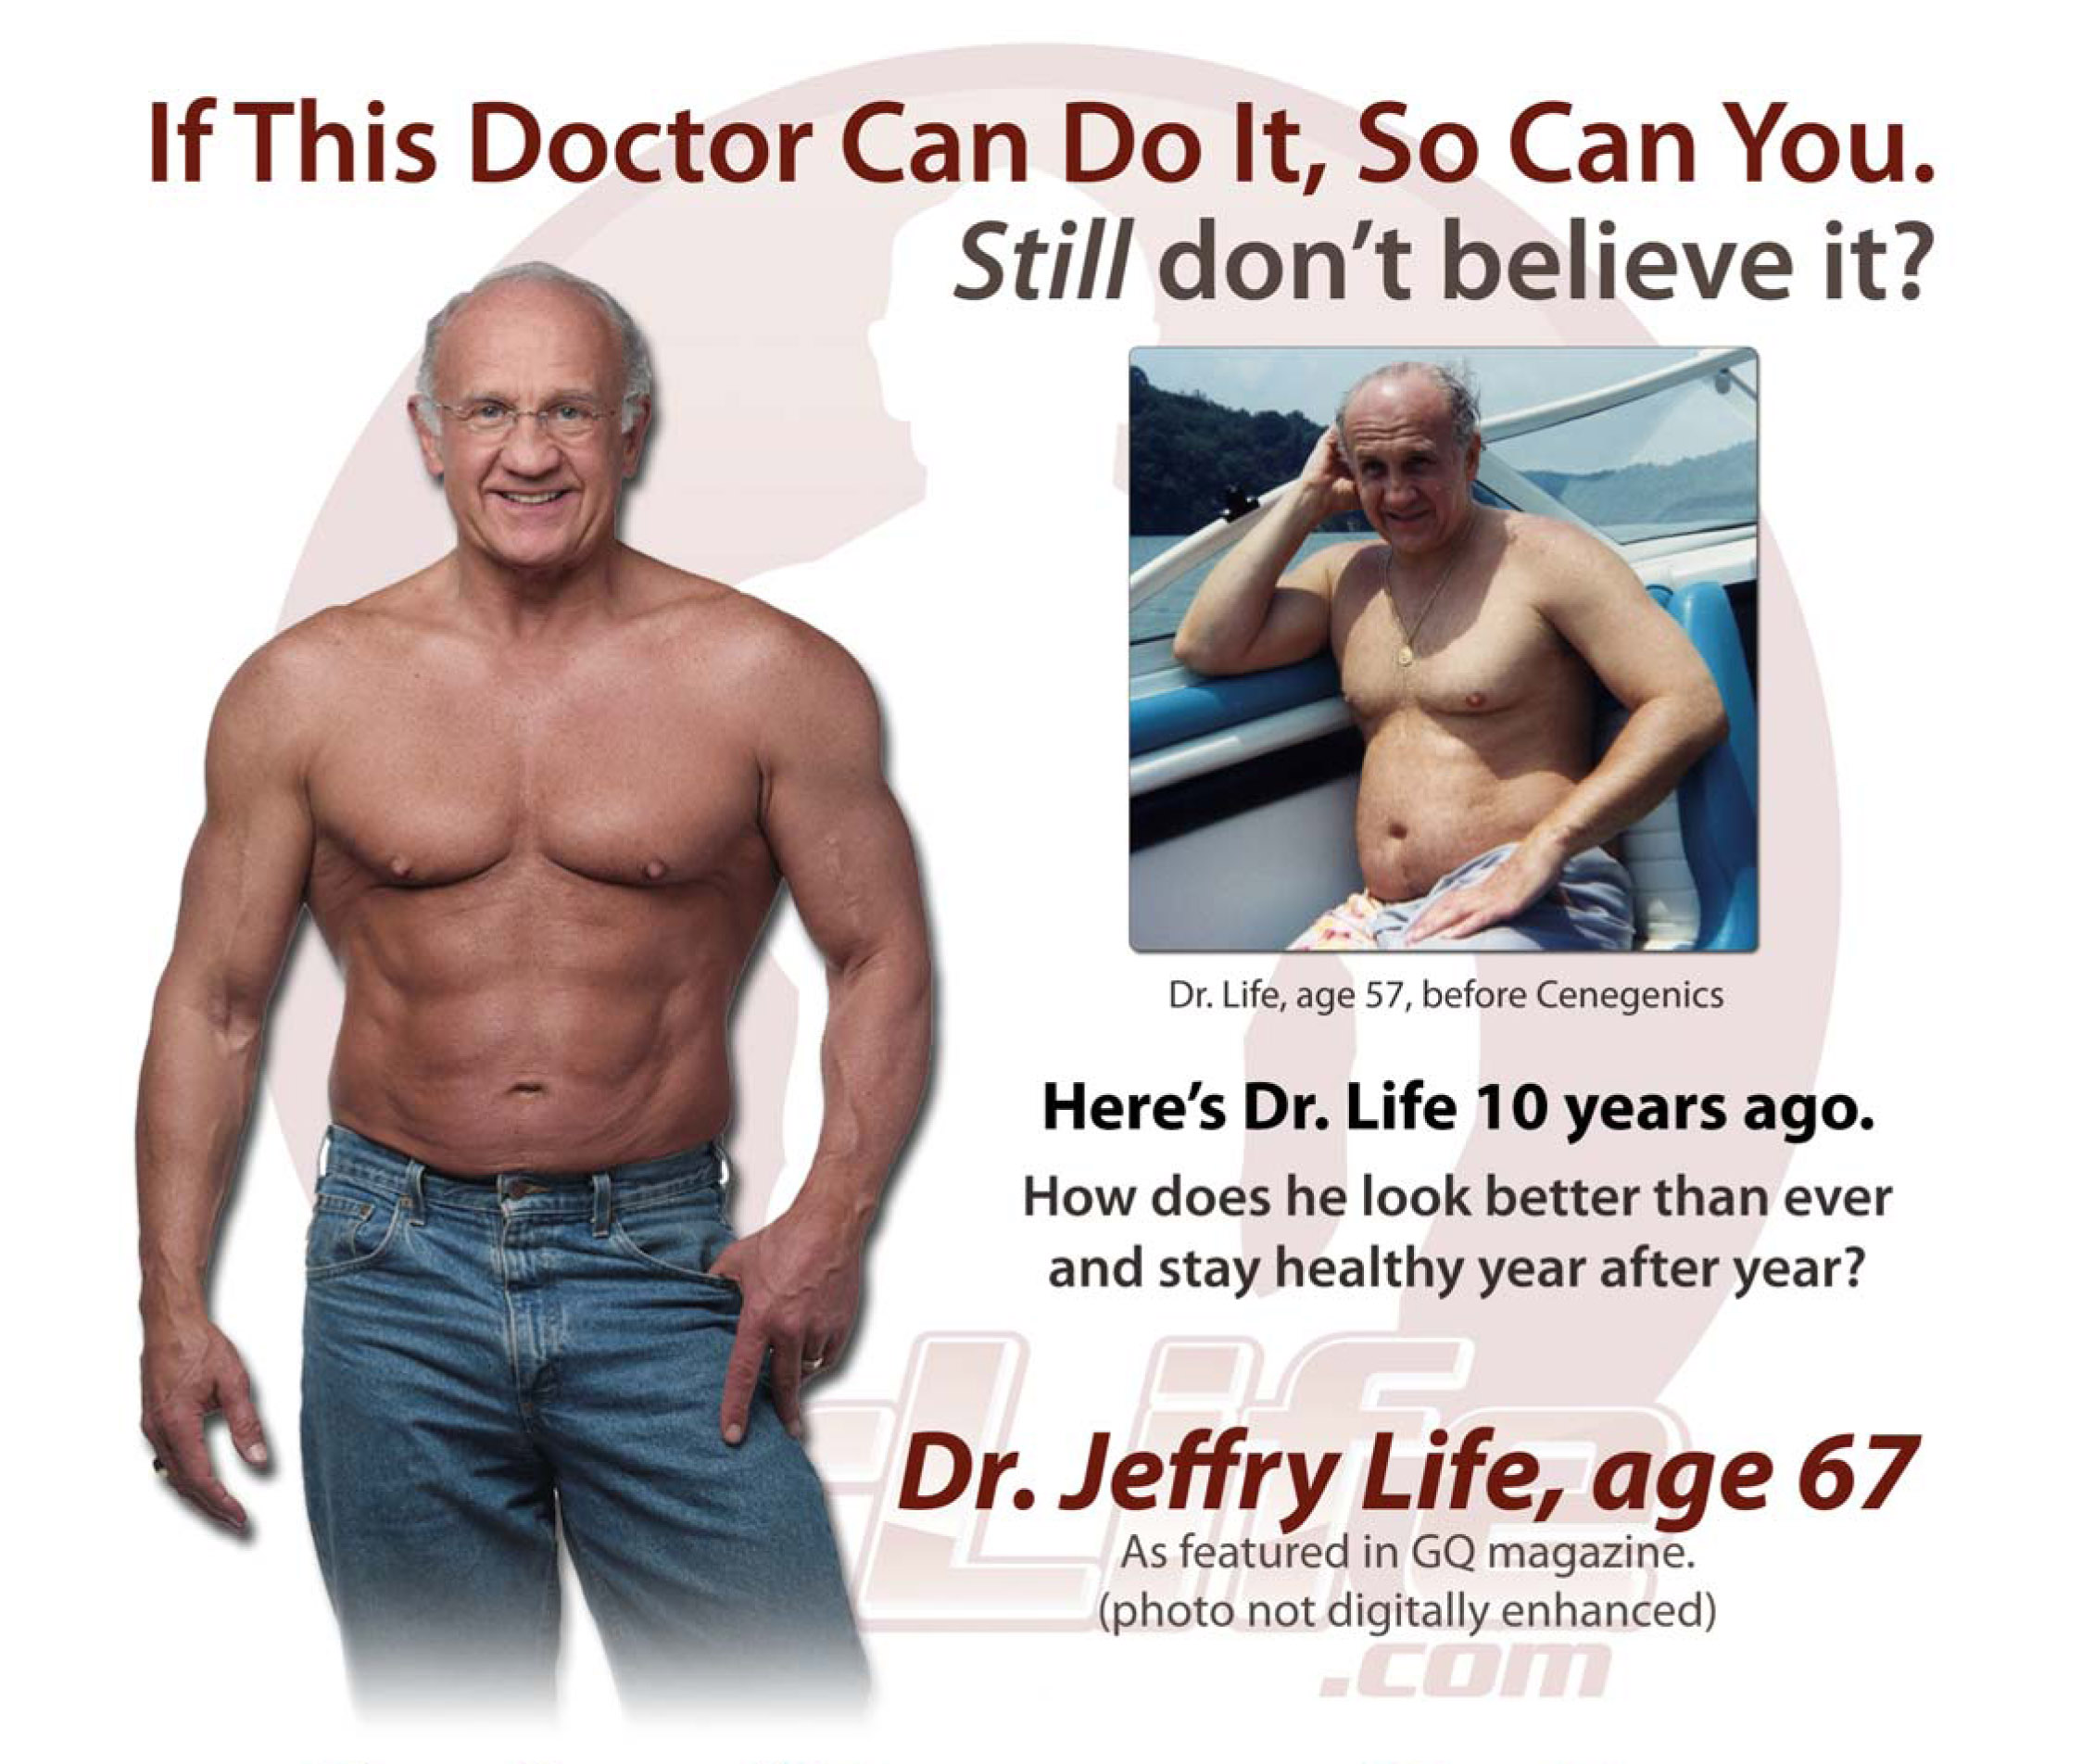 Jeffry the life pdf plan life